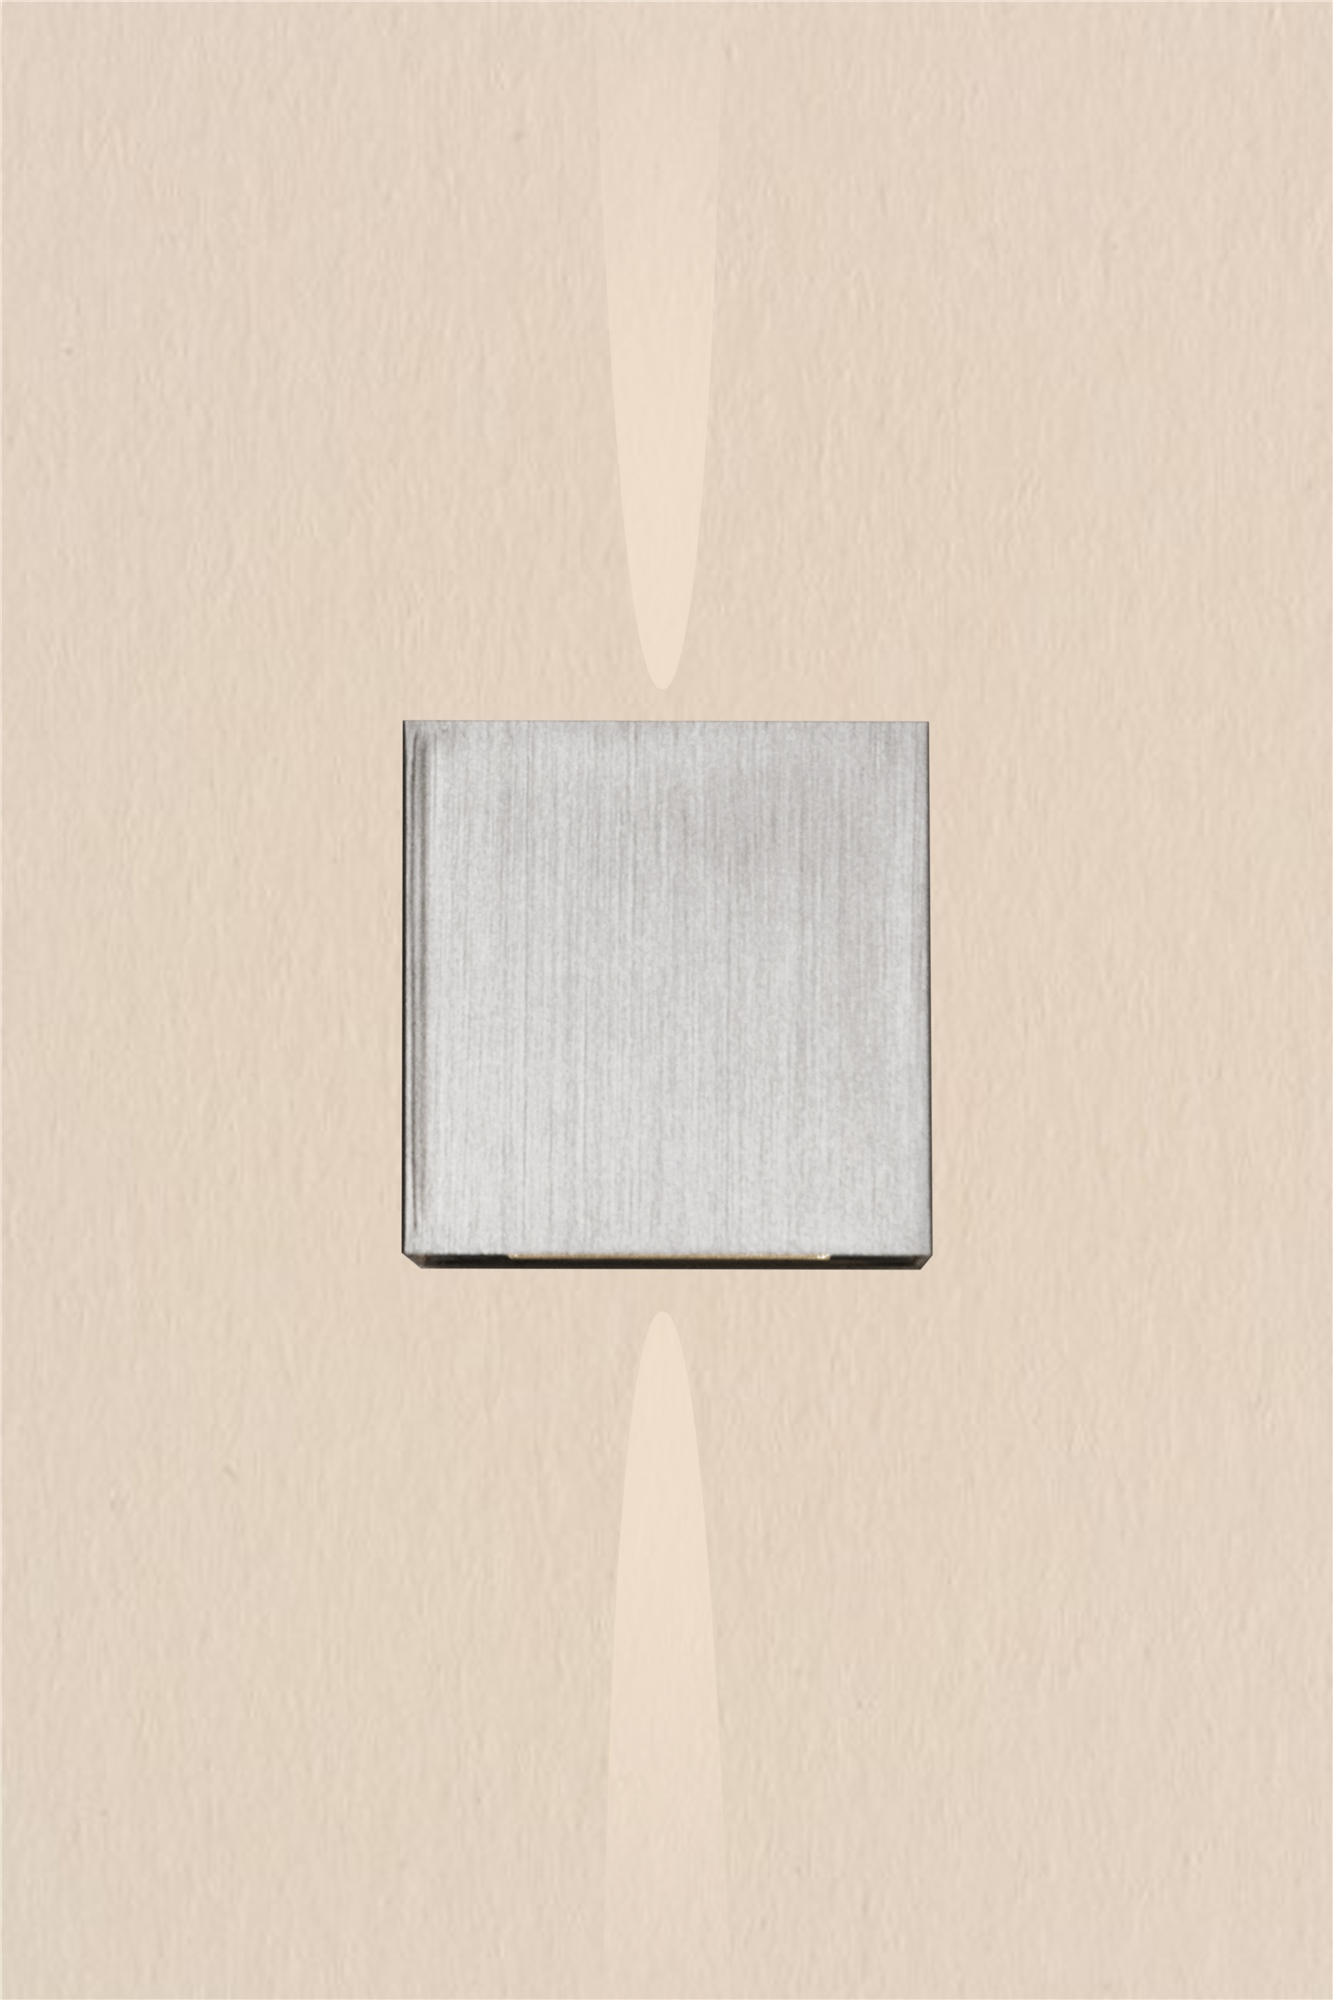 Lampenlux LED Up/Down Wandleuchte Wandlampe Amon schmal-schmal Stimmungslicht silber G9 4W